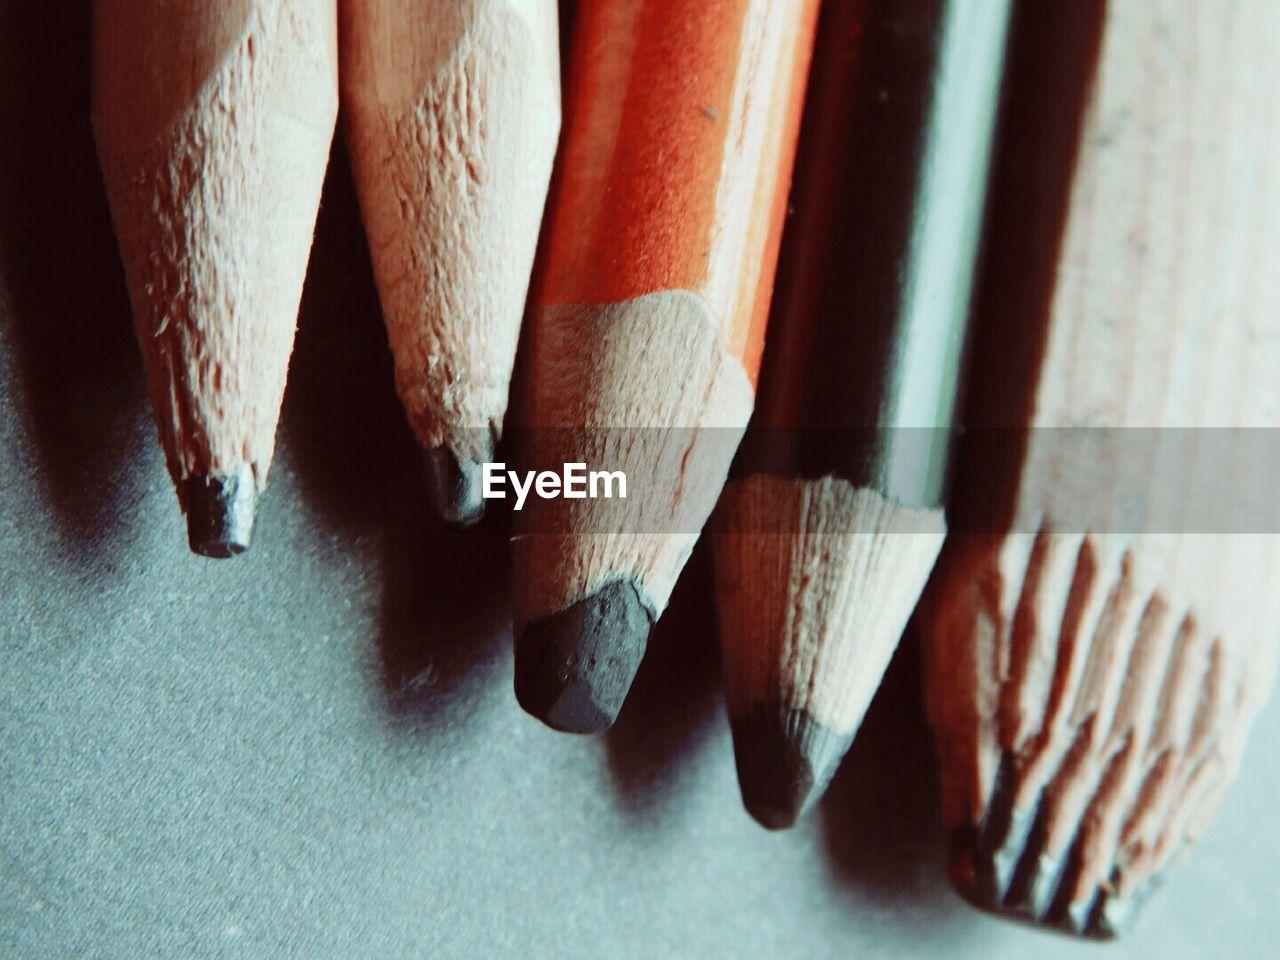 High Angle View Of Pencils On Table